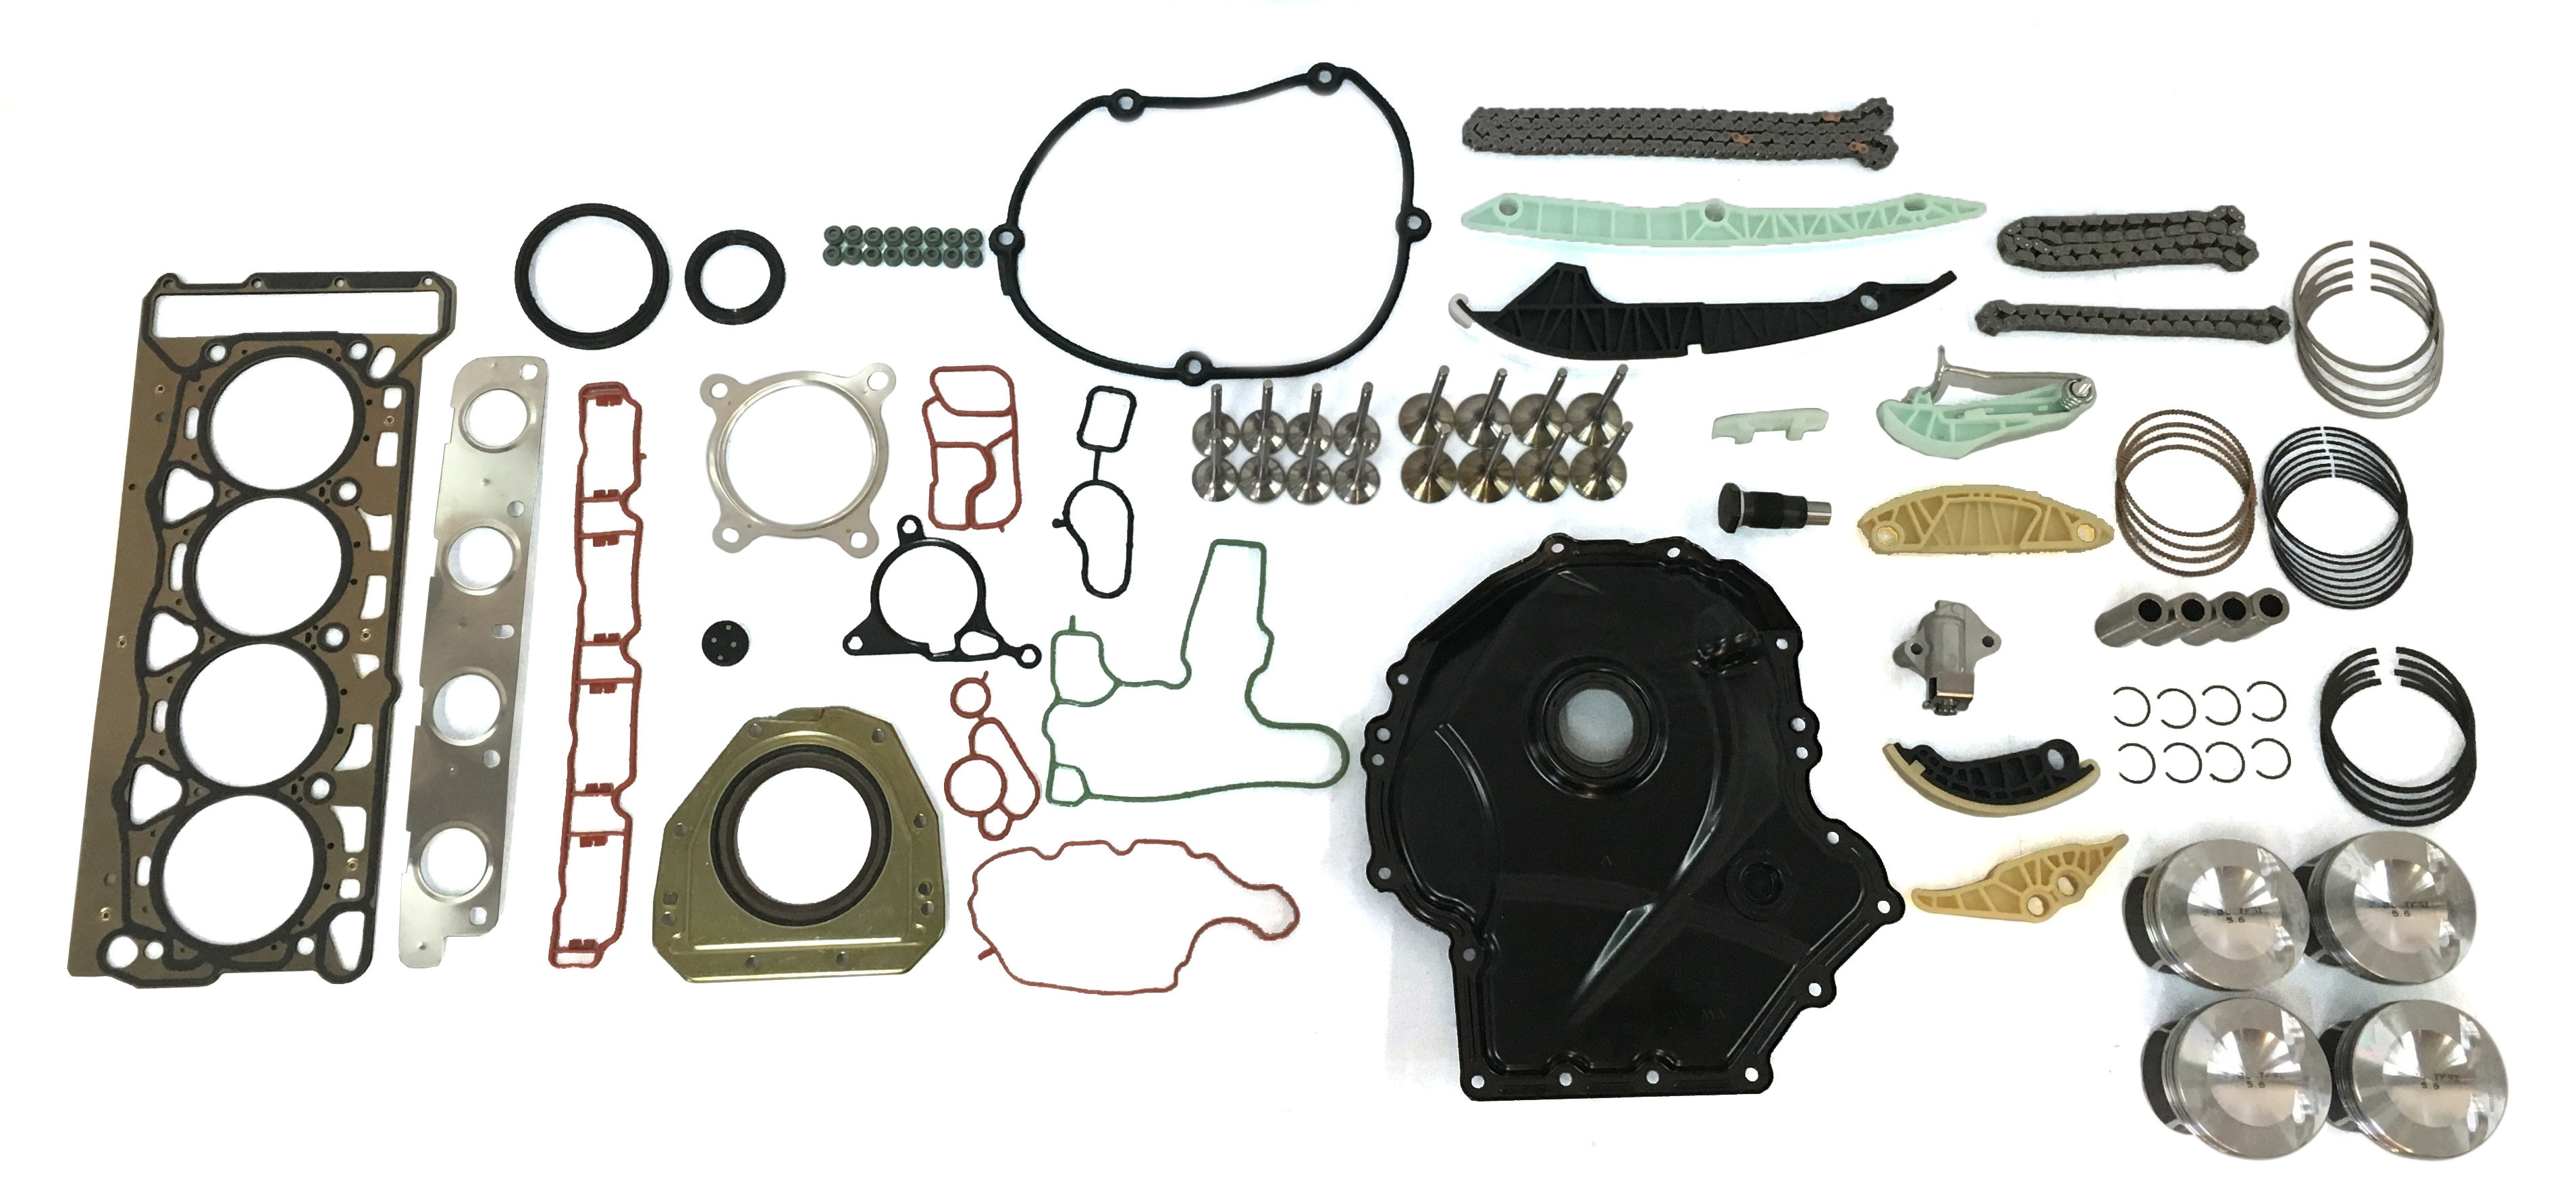 Joint de culasse kit de Joints de VW Audi Seat Skoda 2,0 TSI TSI CAE CAEB NOUVEAU